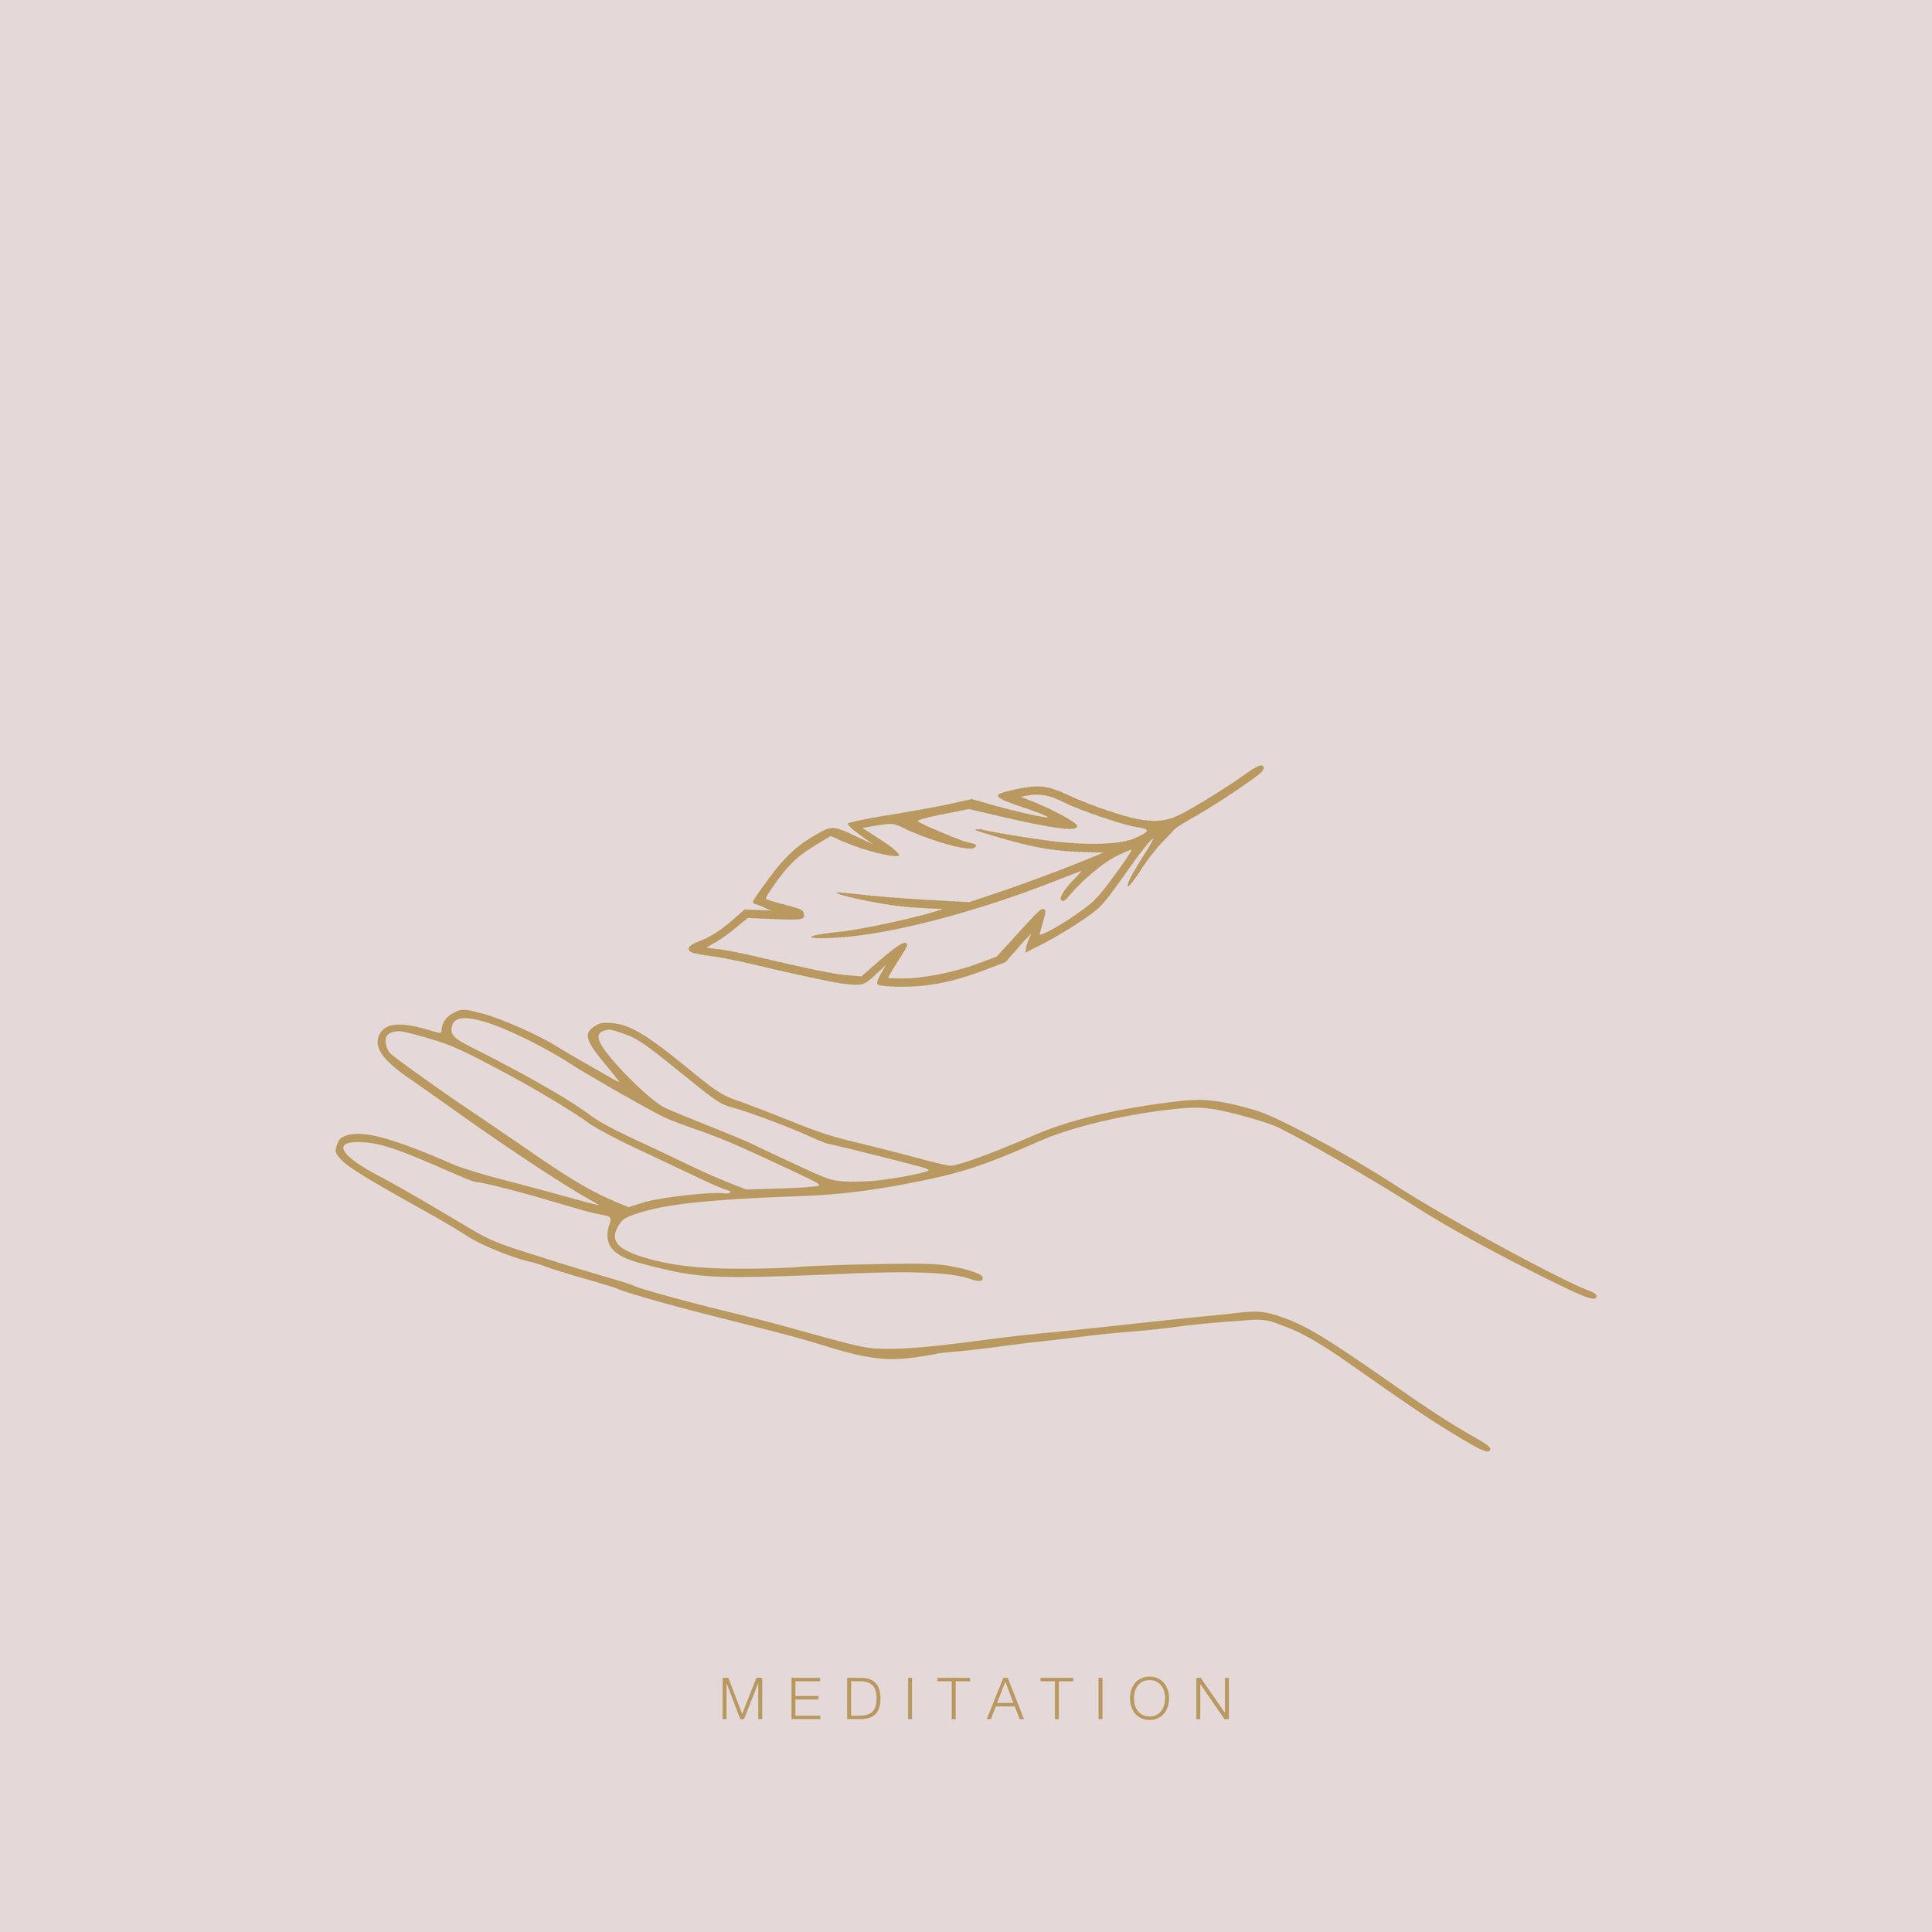 meditation_graphic.jpg